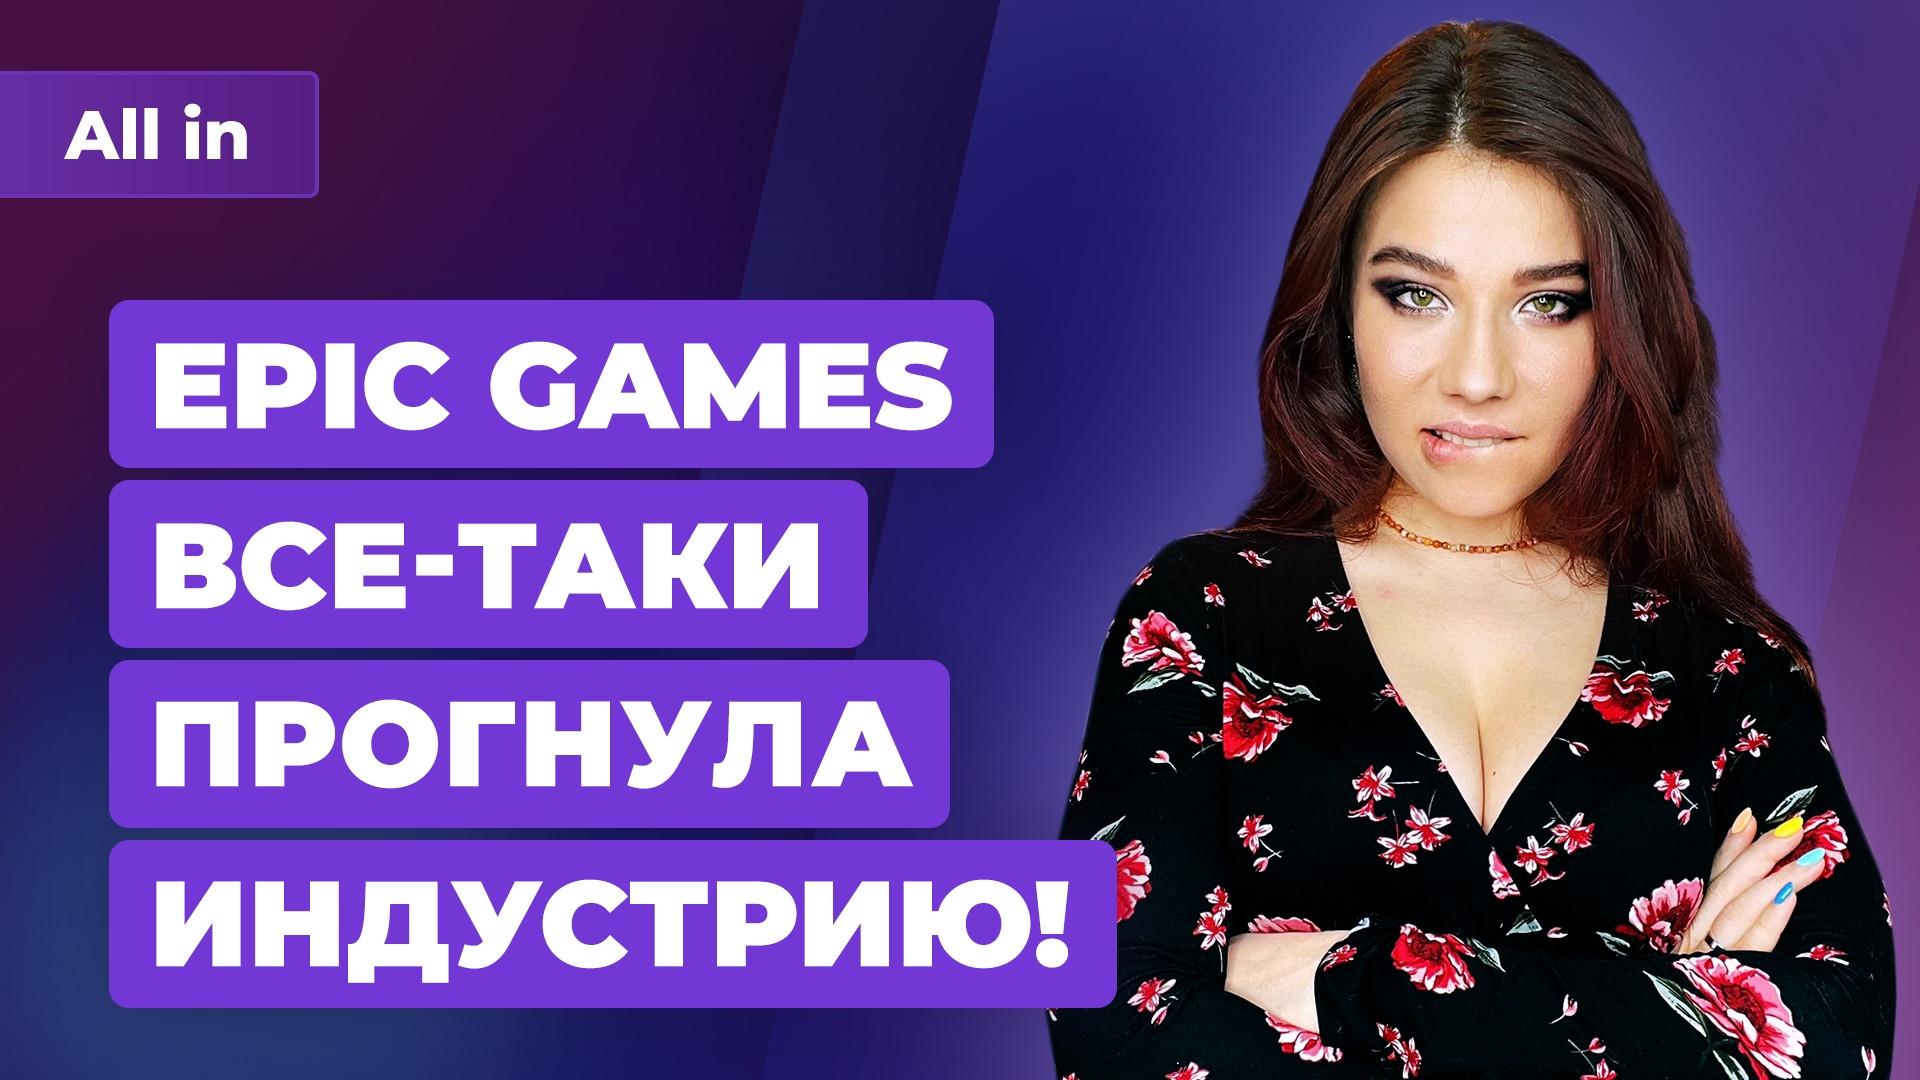 Шоу Sony PlayStation, актёры Borderlands, суд против Valve и Steam. Игровые новости ALL IN за 30.04